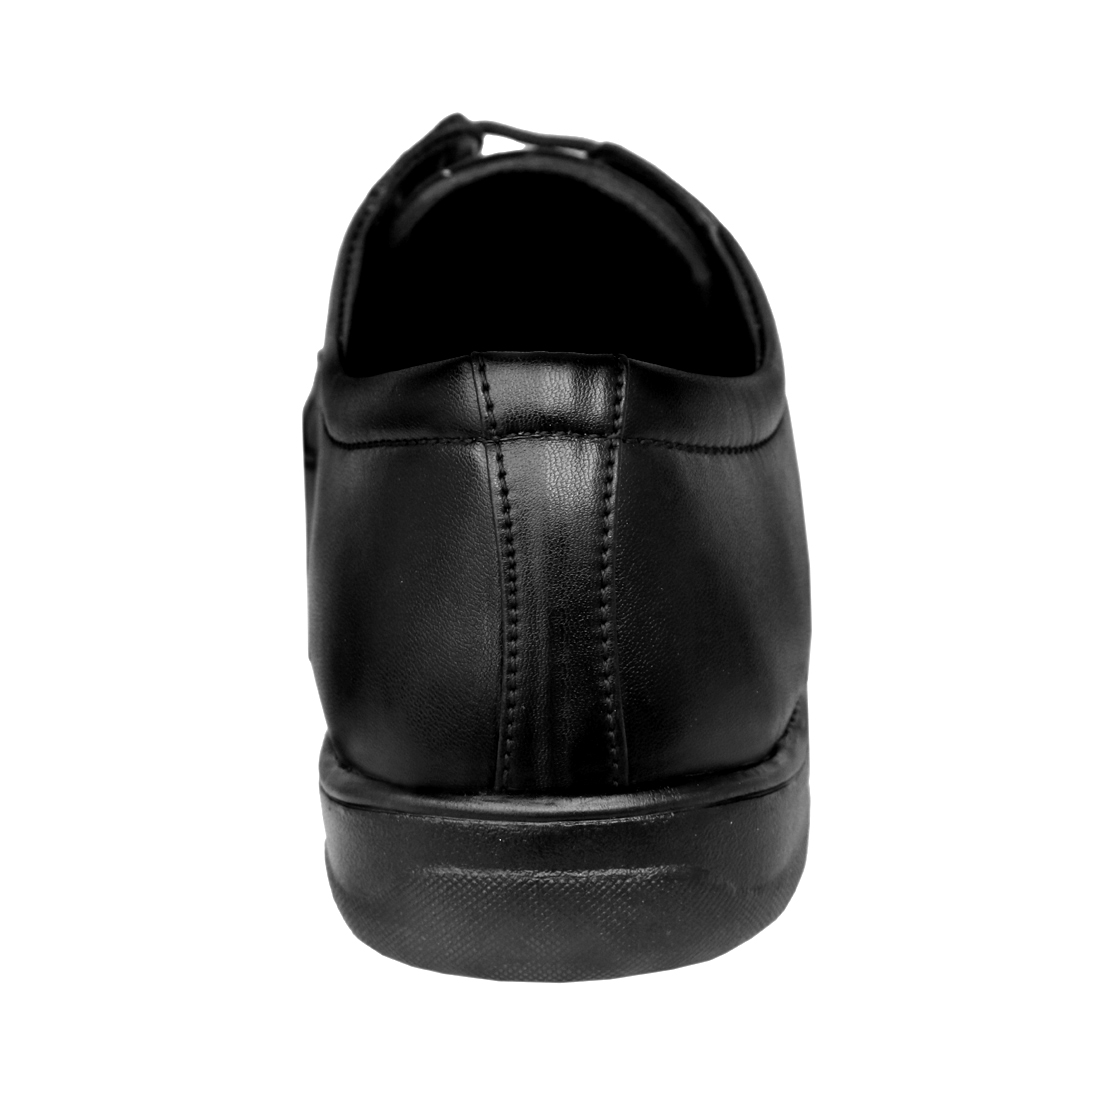 Biggfoot shoes-086